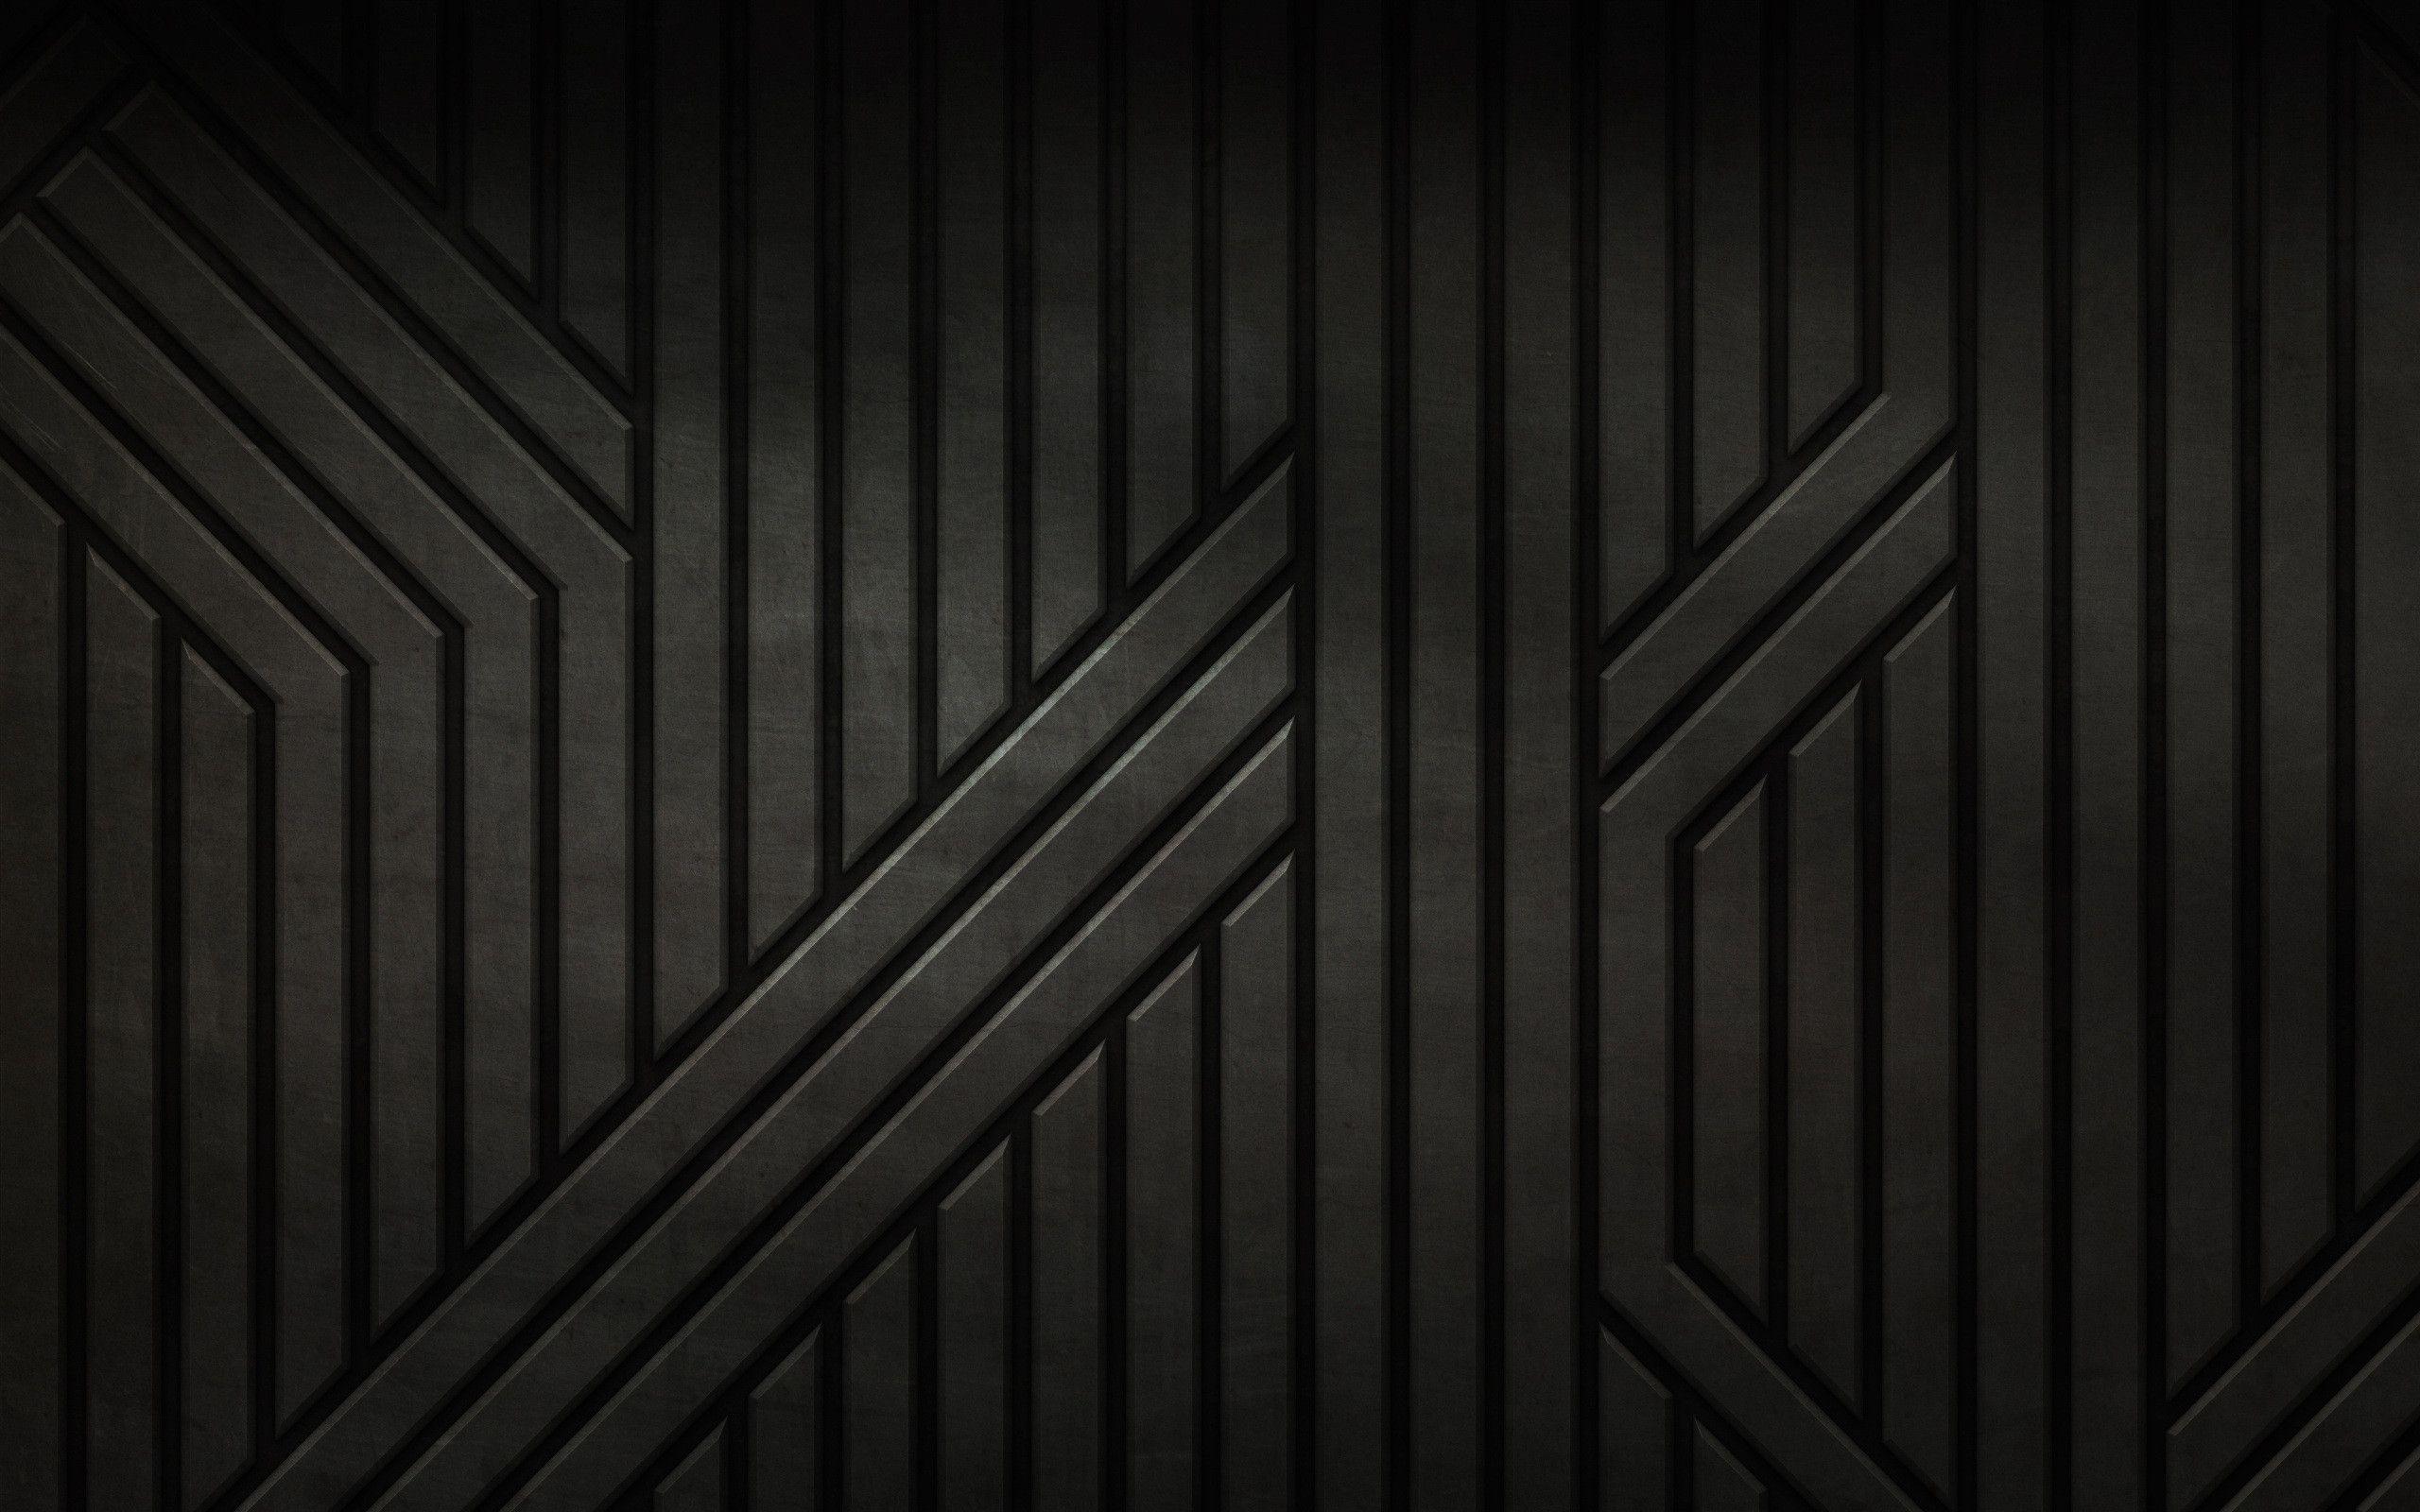 Futuristic Wallpapers Wallpaper Cave Textured Wallpaper Black Textured Wallpaper Carbon Fiber Wallpaper